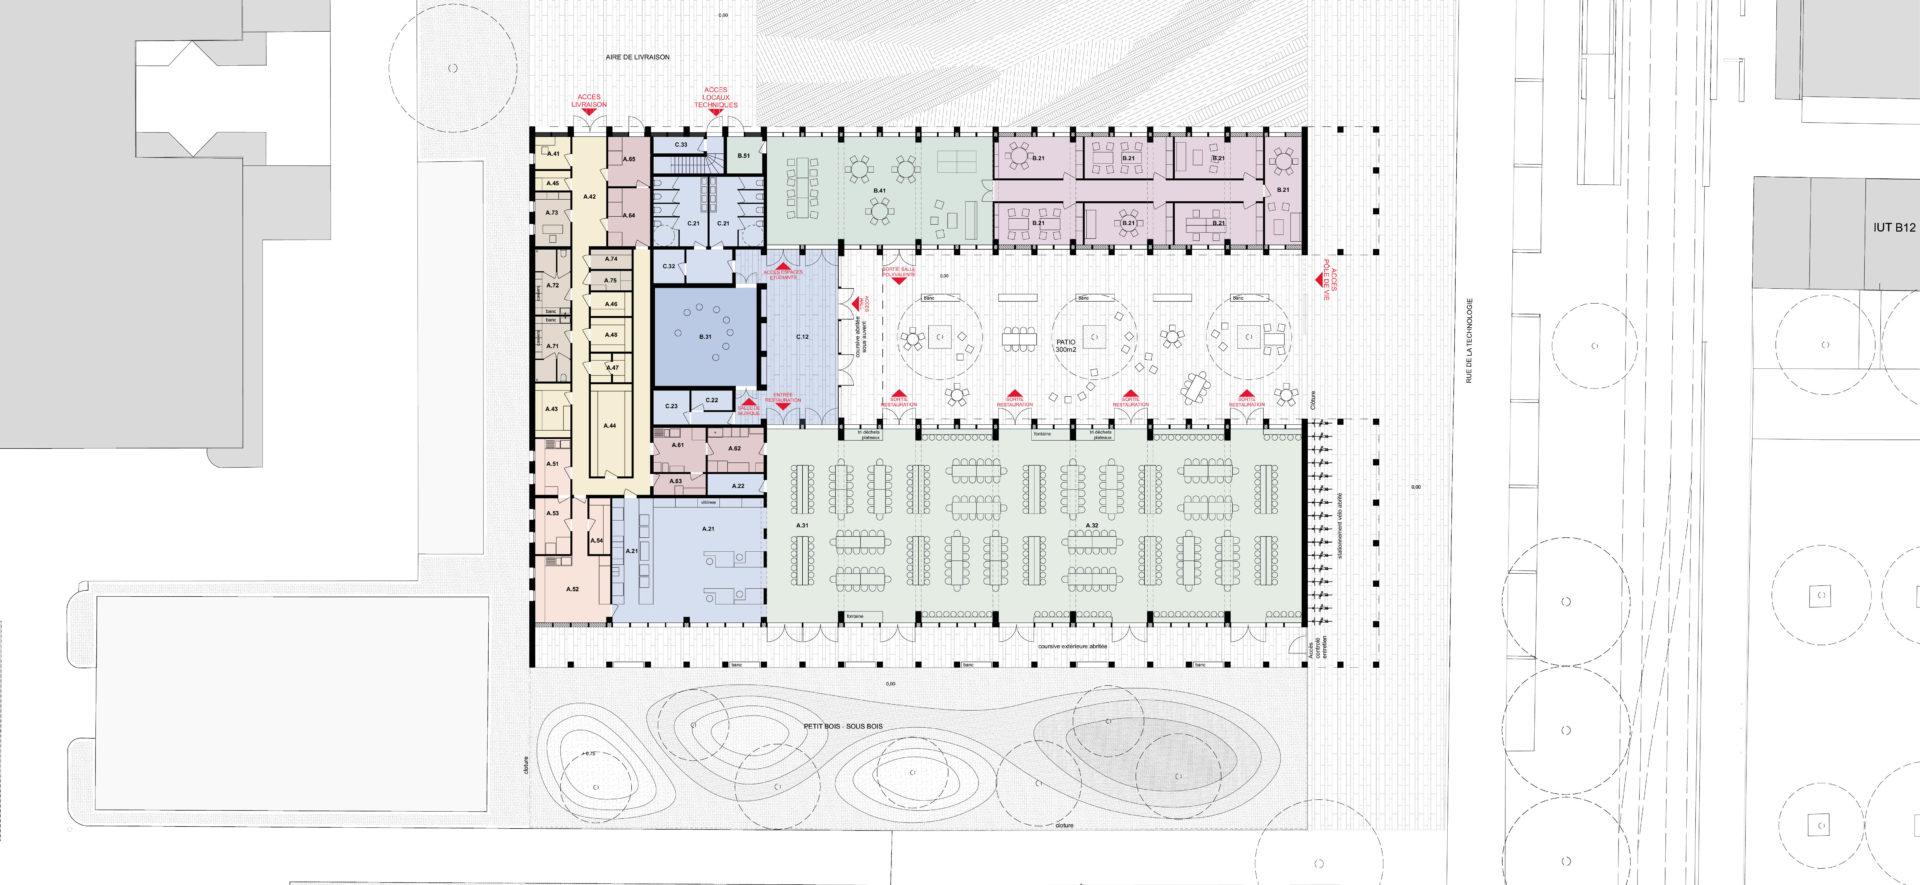 PVL-Gabarit-unic-web-projets-2560x1180px9